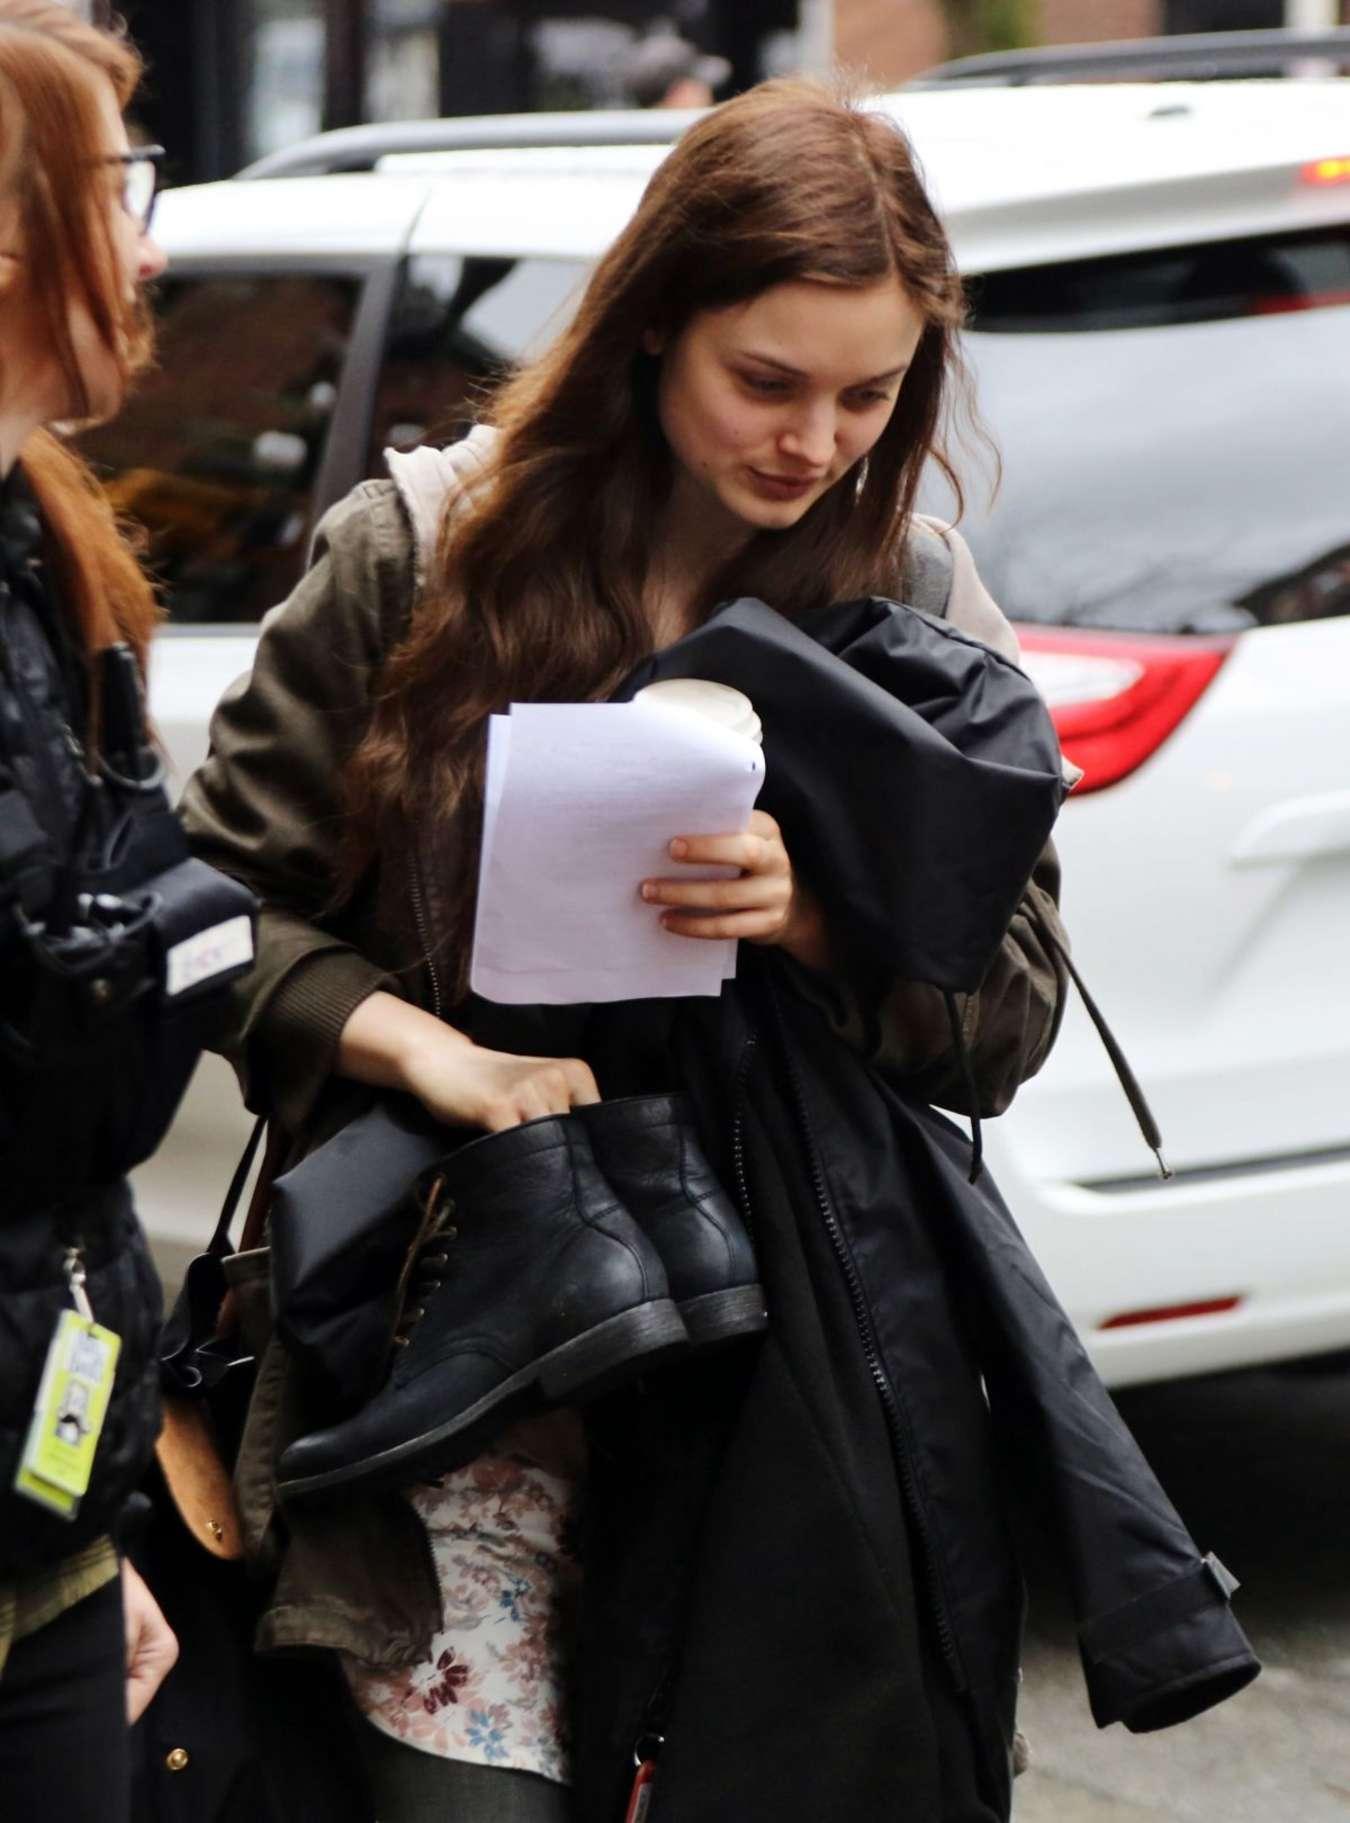 Bella Heathcote - Arrives at 'Fifty Shades Darker' Set in Vancouver